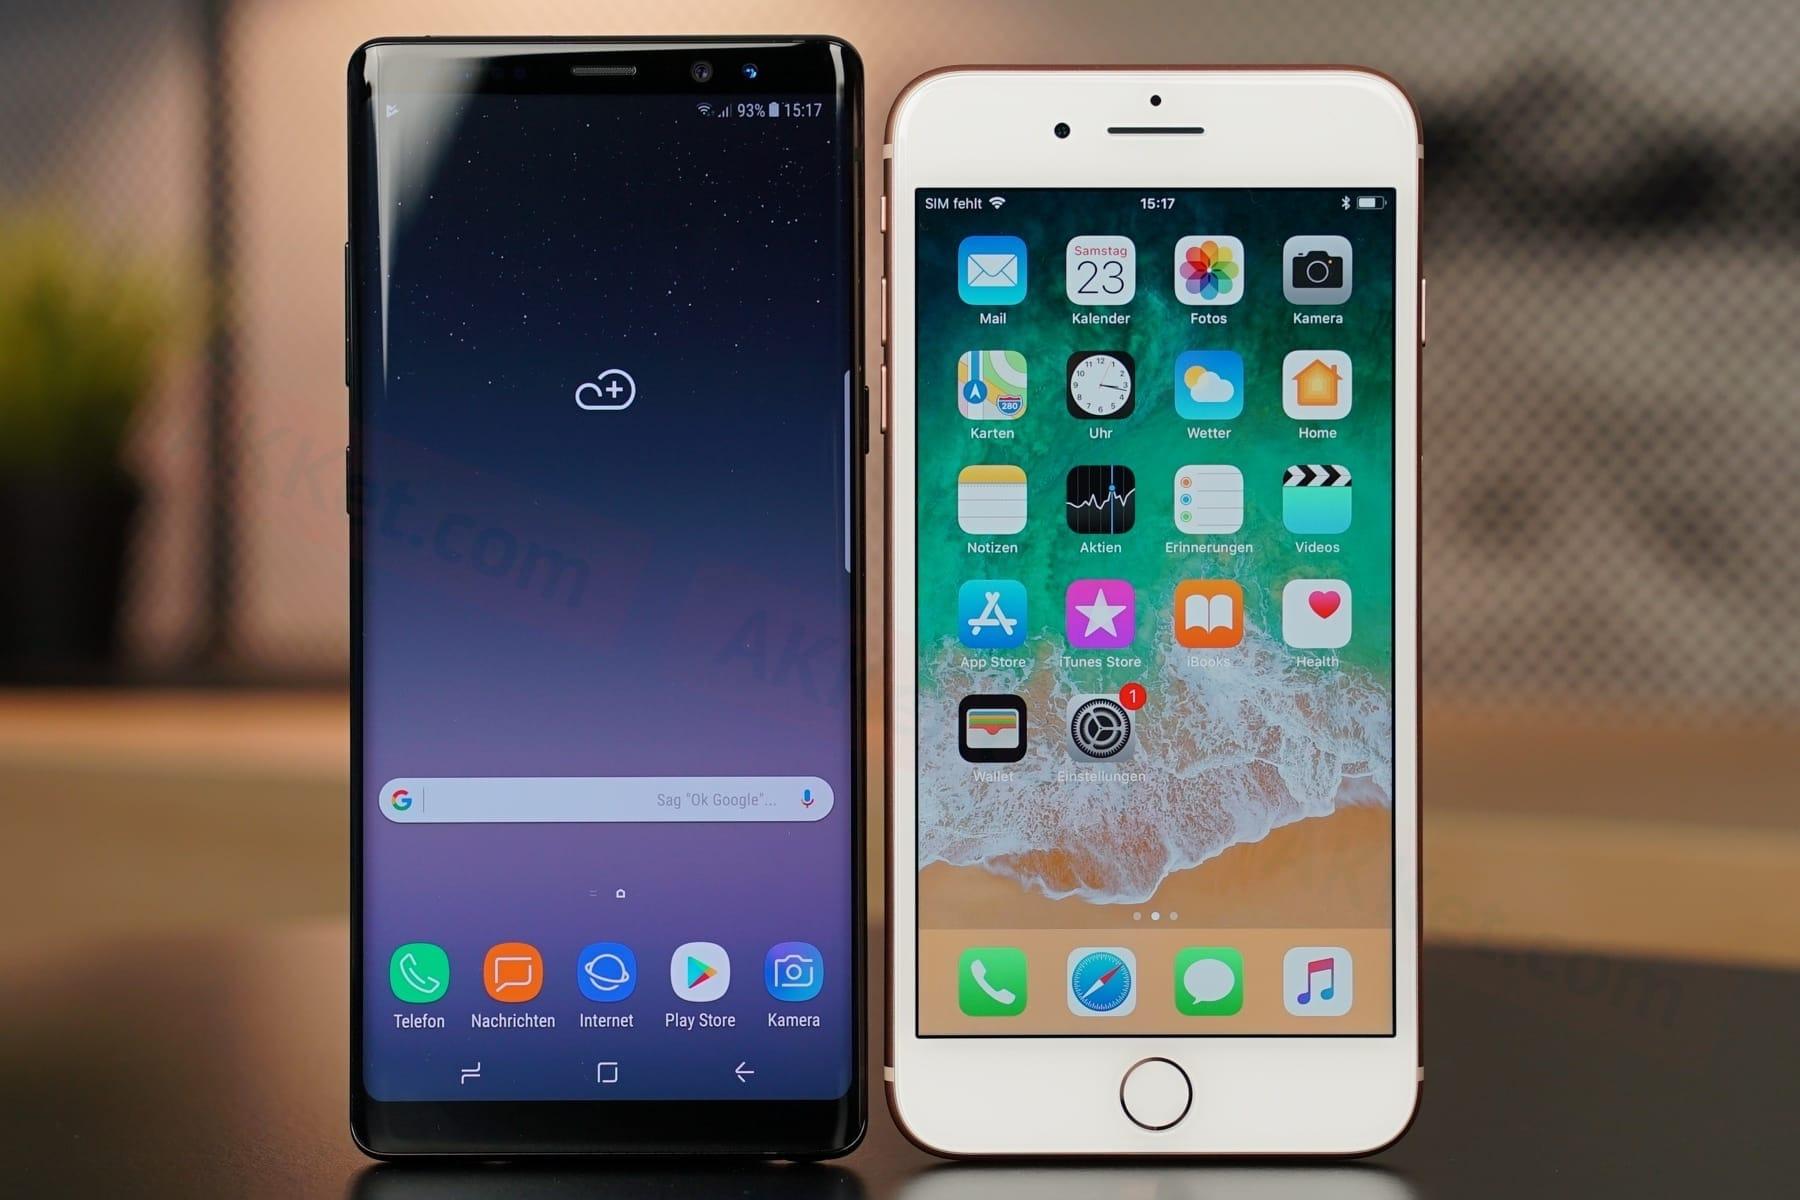 Consumer Reports советует покупать Самсунг Galaxy S7, ноне Apple iPhone 8